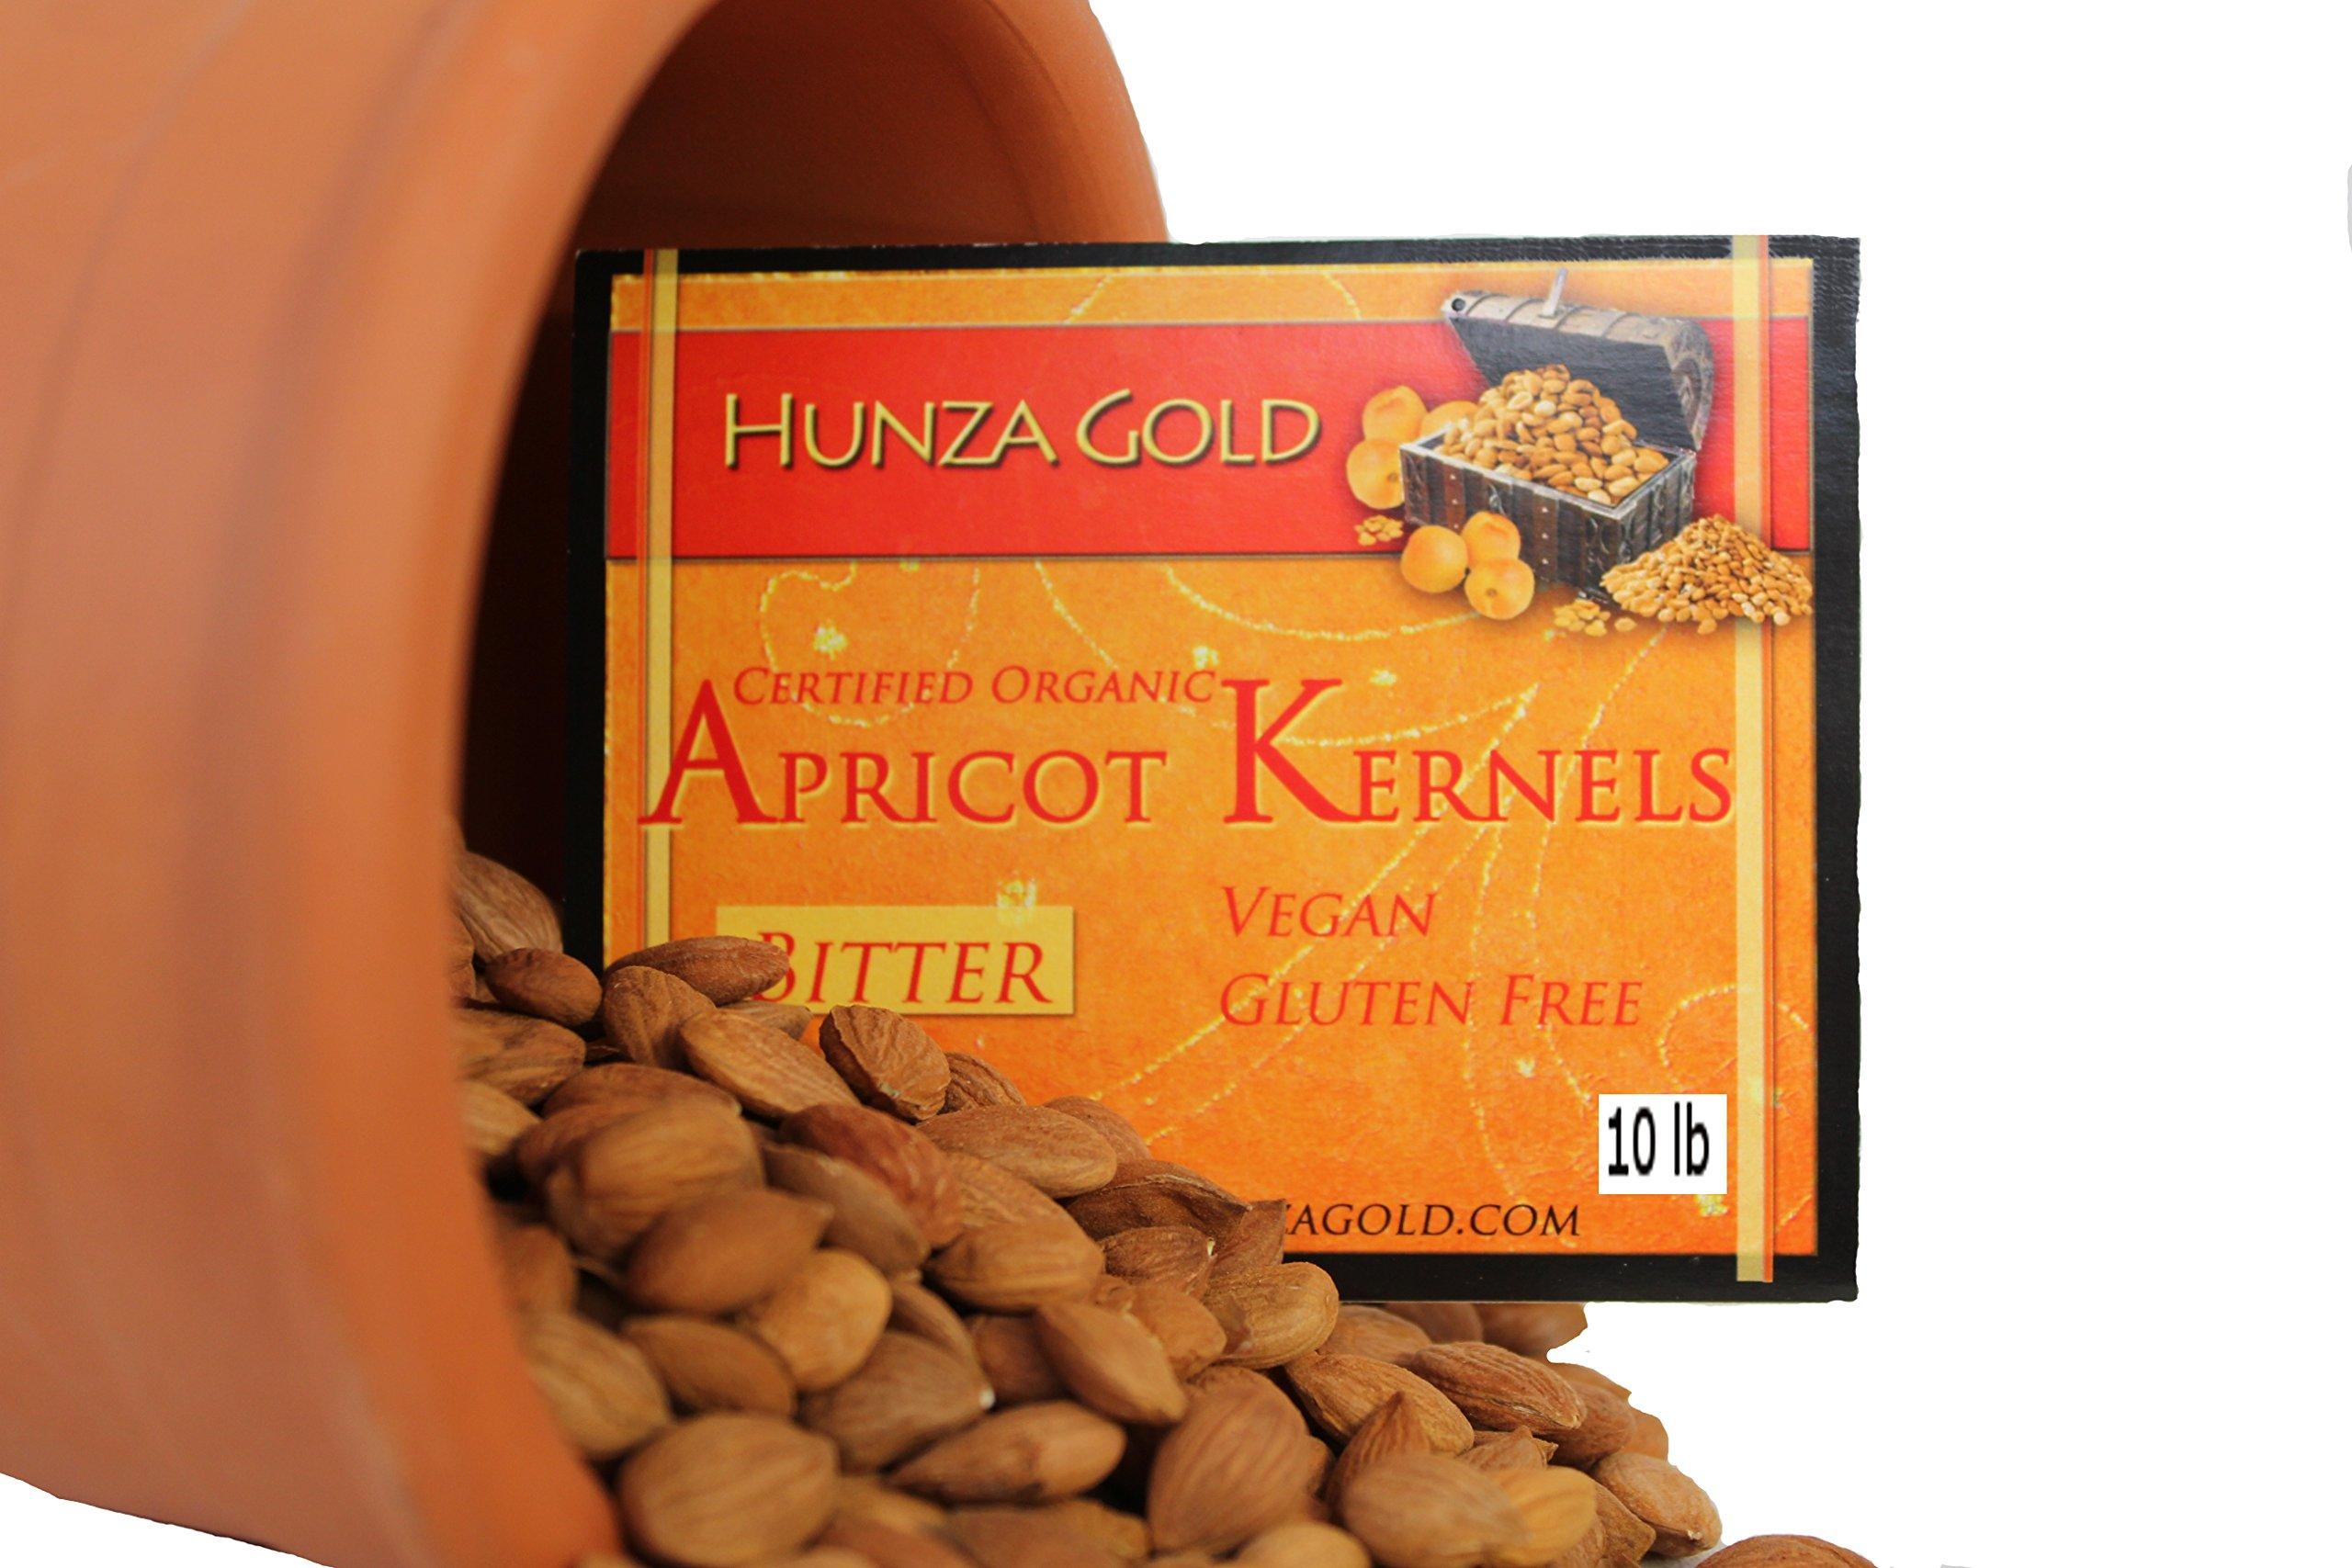 Hunza Gold Certified Organic Bitter Apricot Kernels - 10 Lb